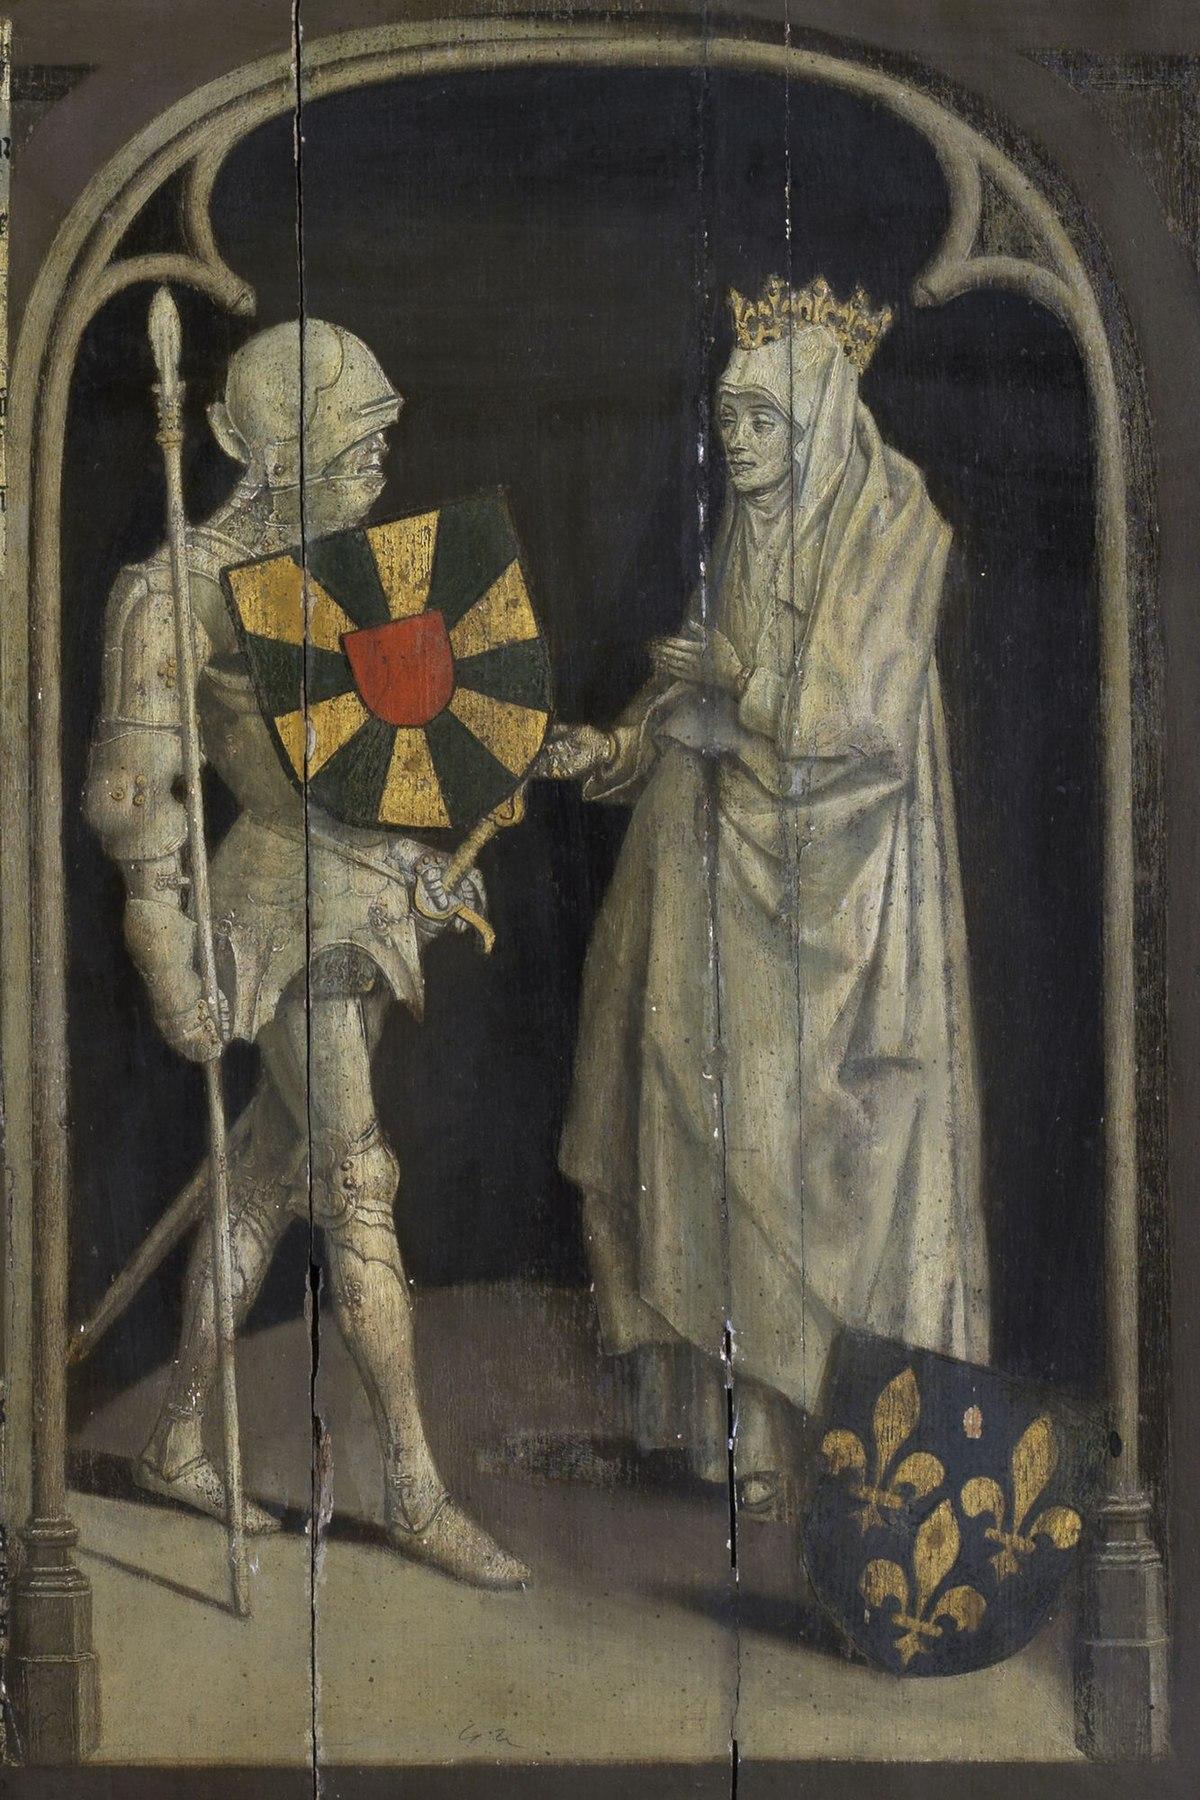 Judith de france wikip dia - Le roi du matelas cambrai ...